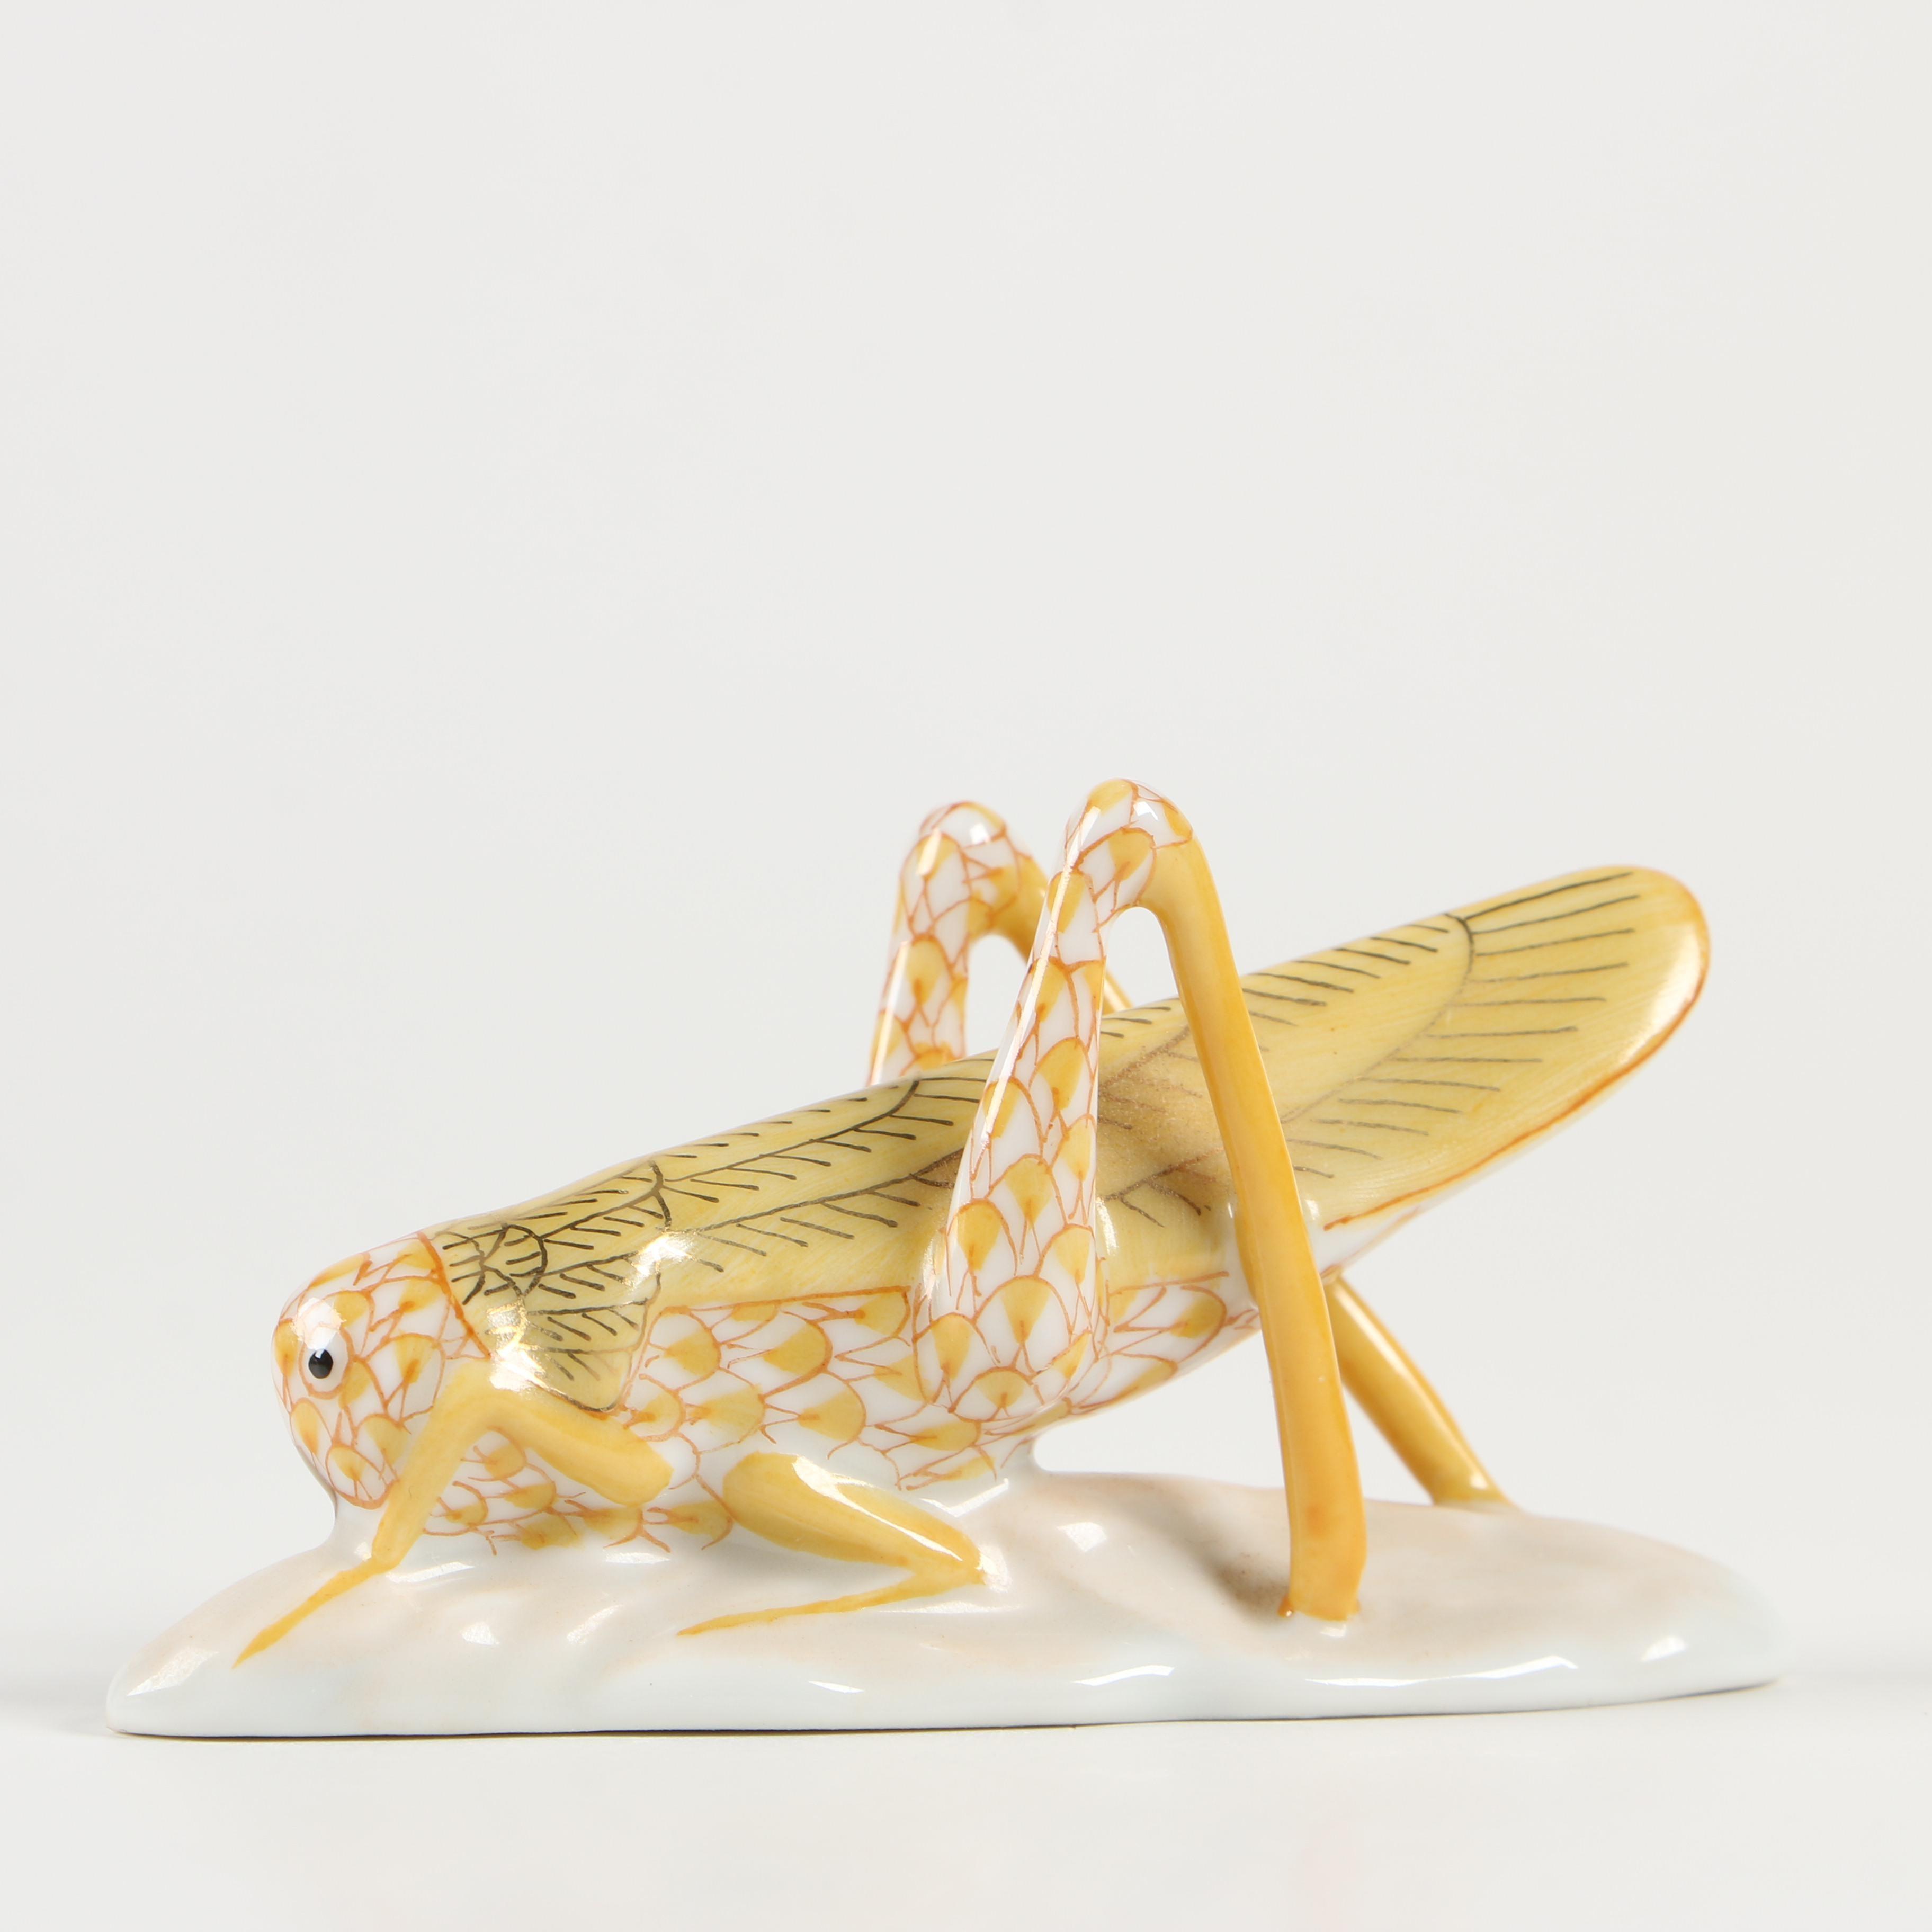 "Herend Butterscotch Fishnet ""Grasshopper"" Porcelain Figurine, January 1997"